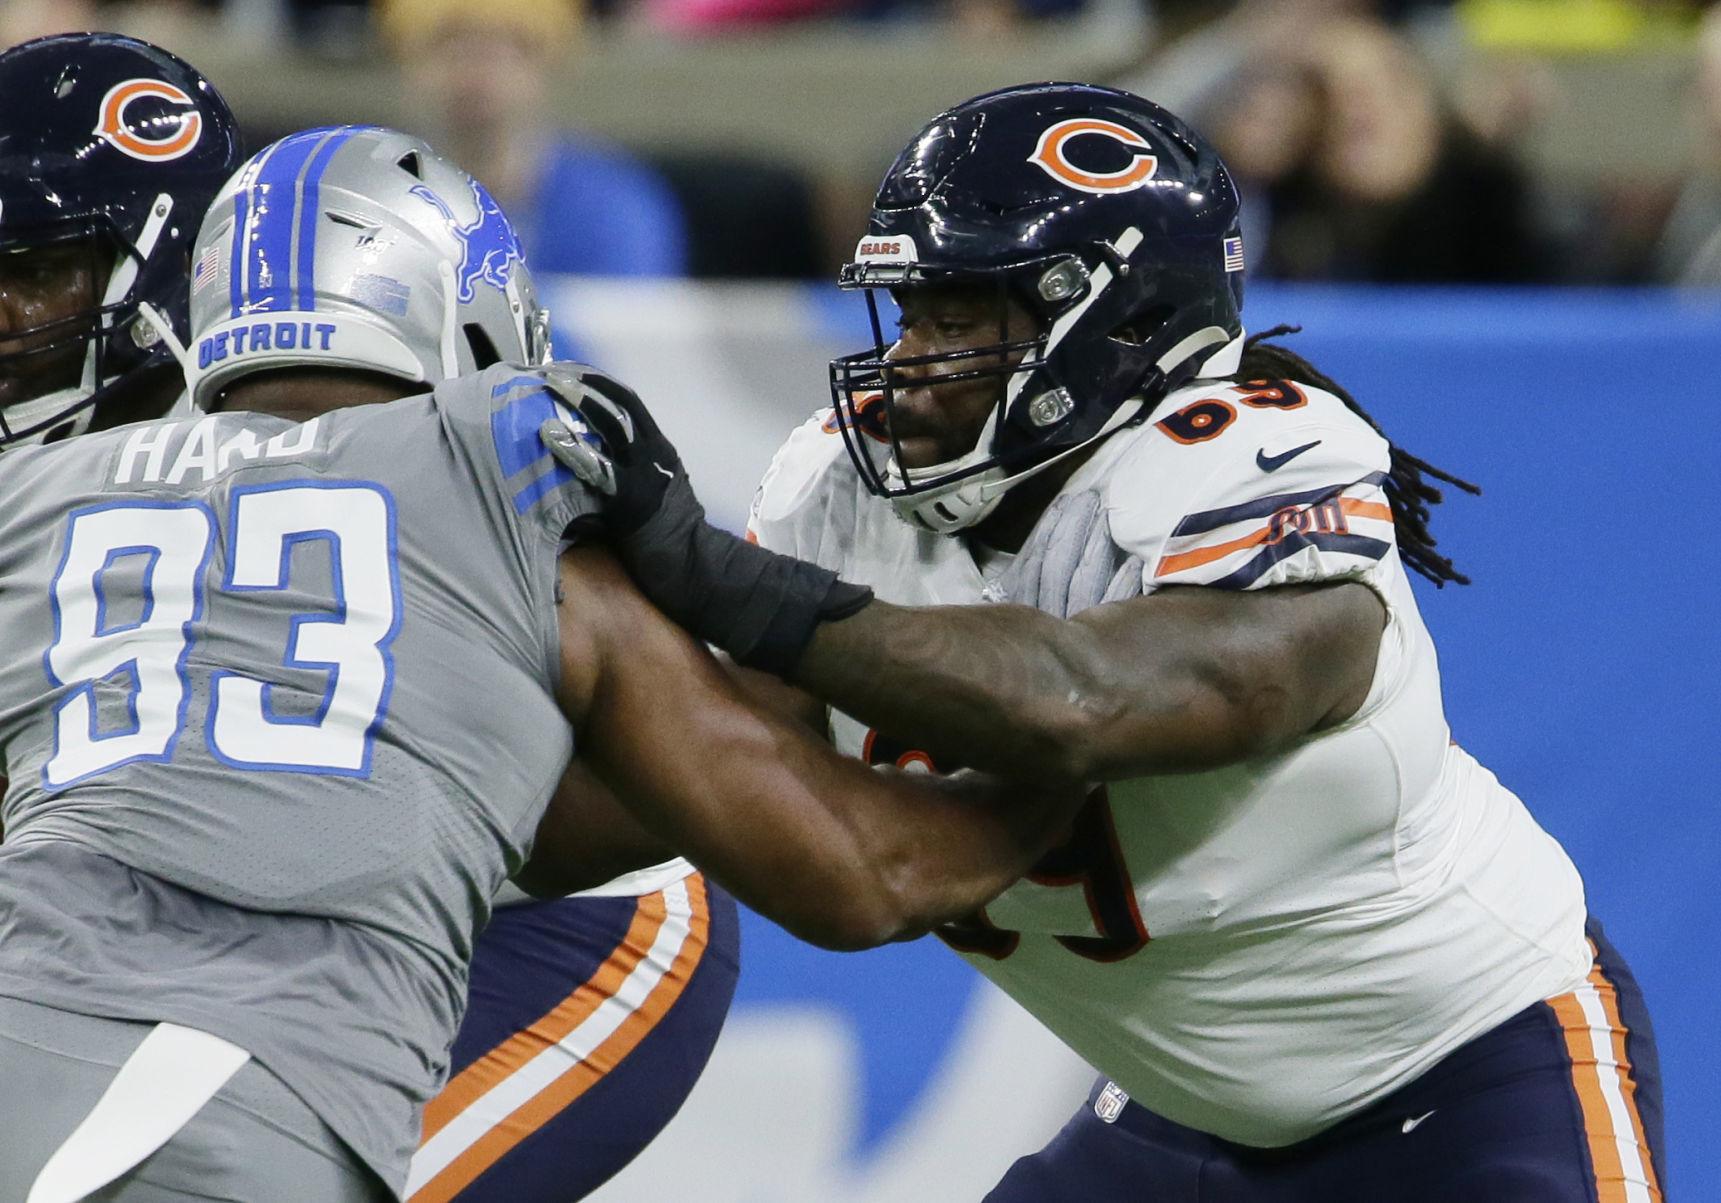 Size: 8 x 10 Chicago Bears Defense 2018 Touchdown Celebration Photo